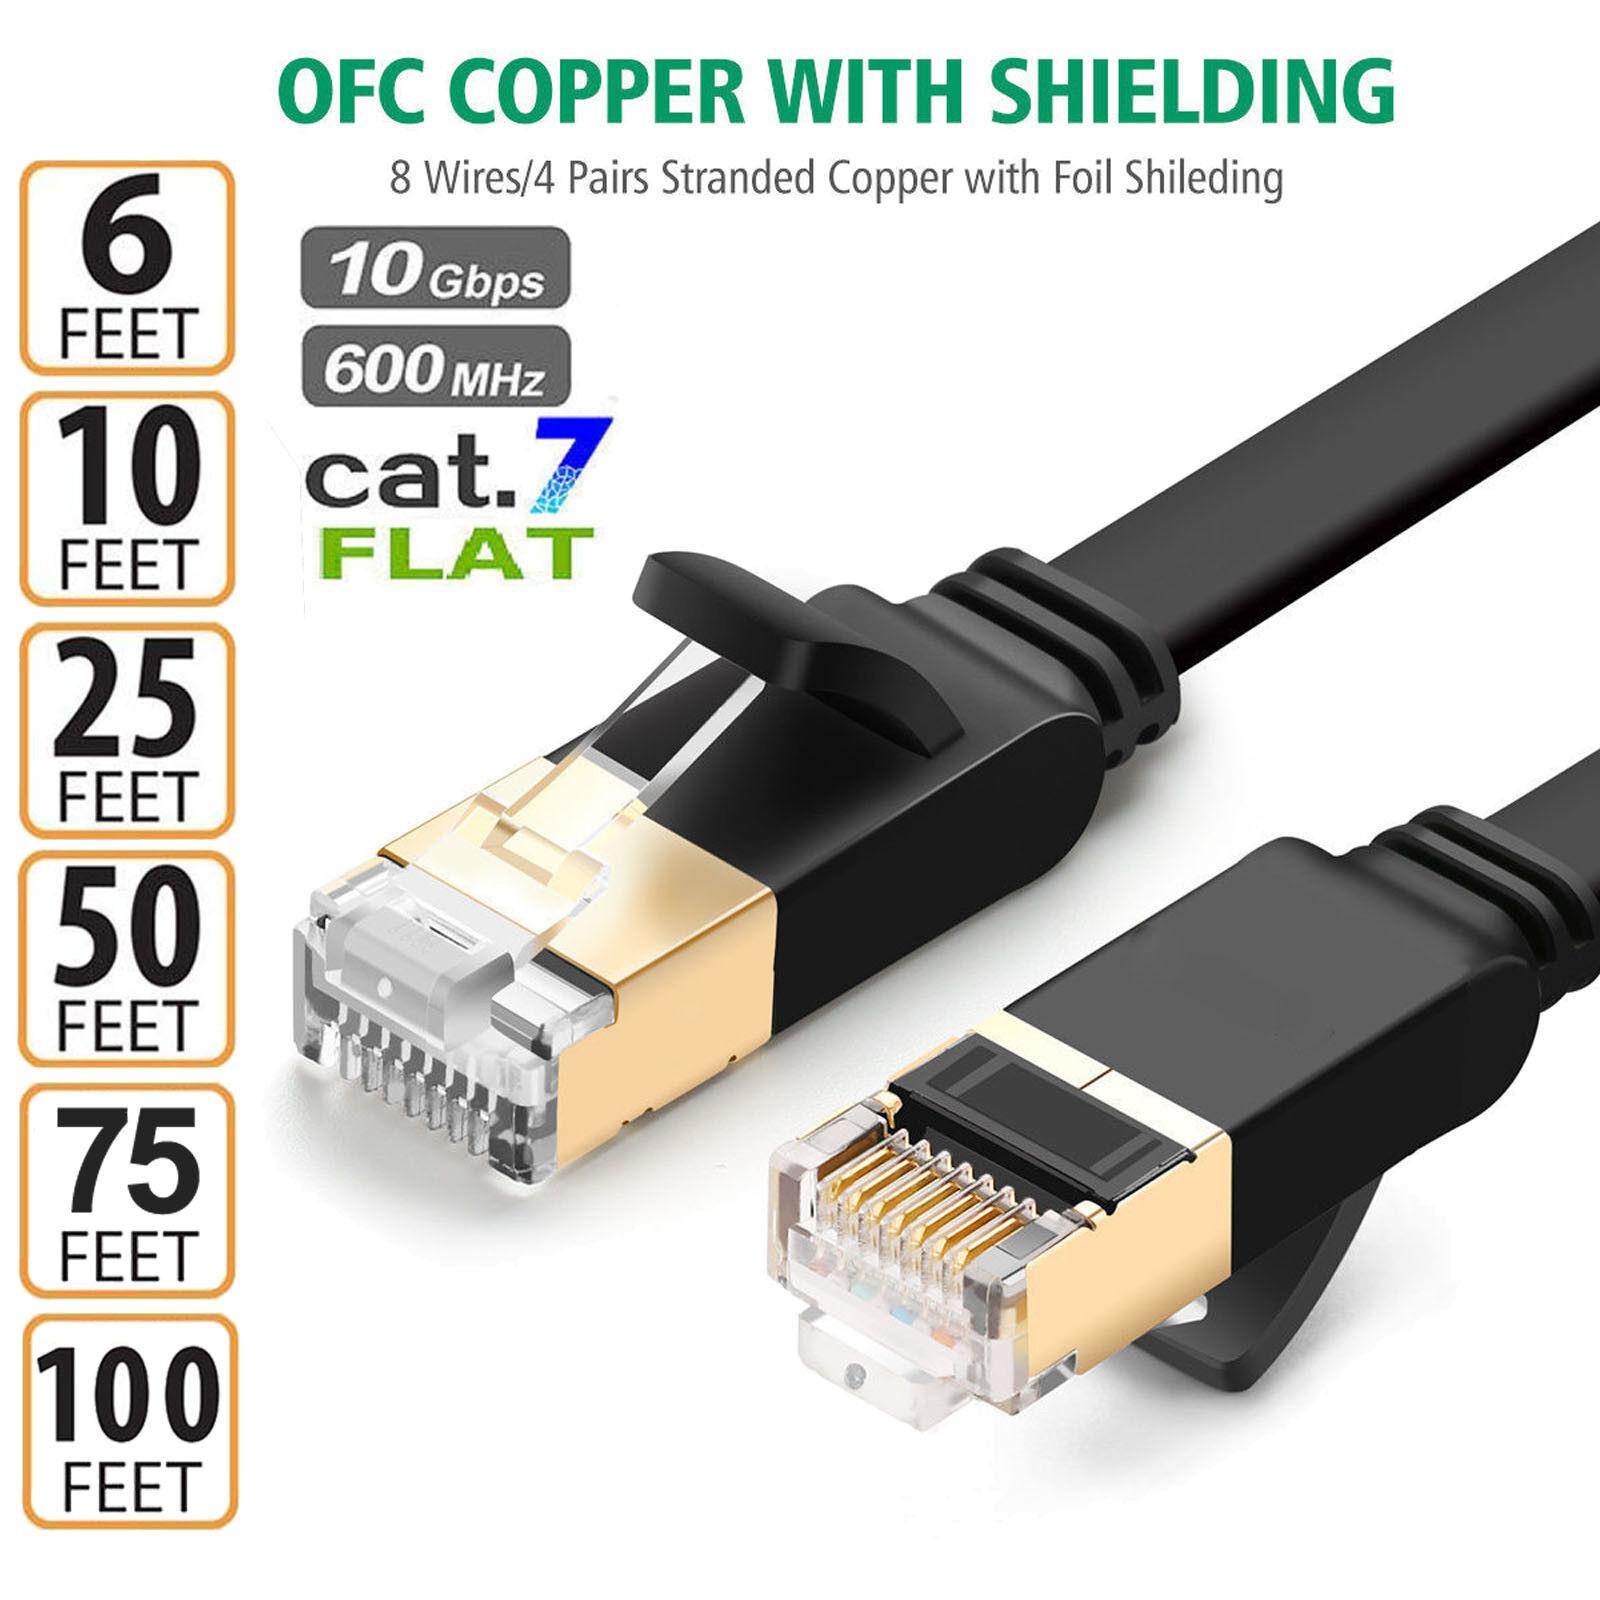 CAT7 10 Gigabit Ethernet Ultra Flat Patch Cable Modem Router